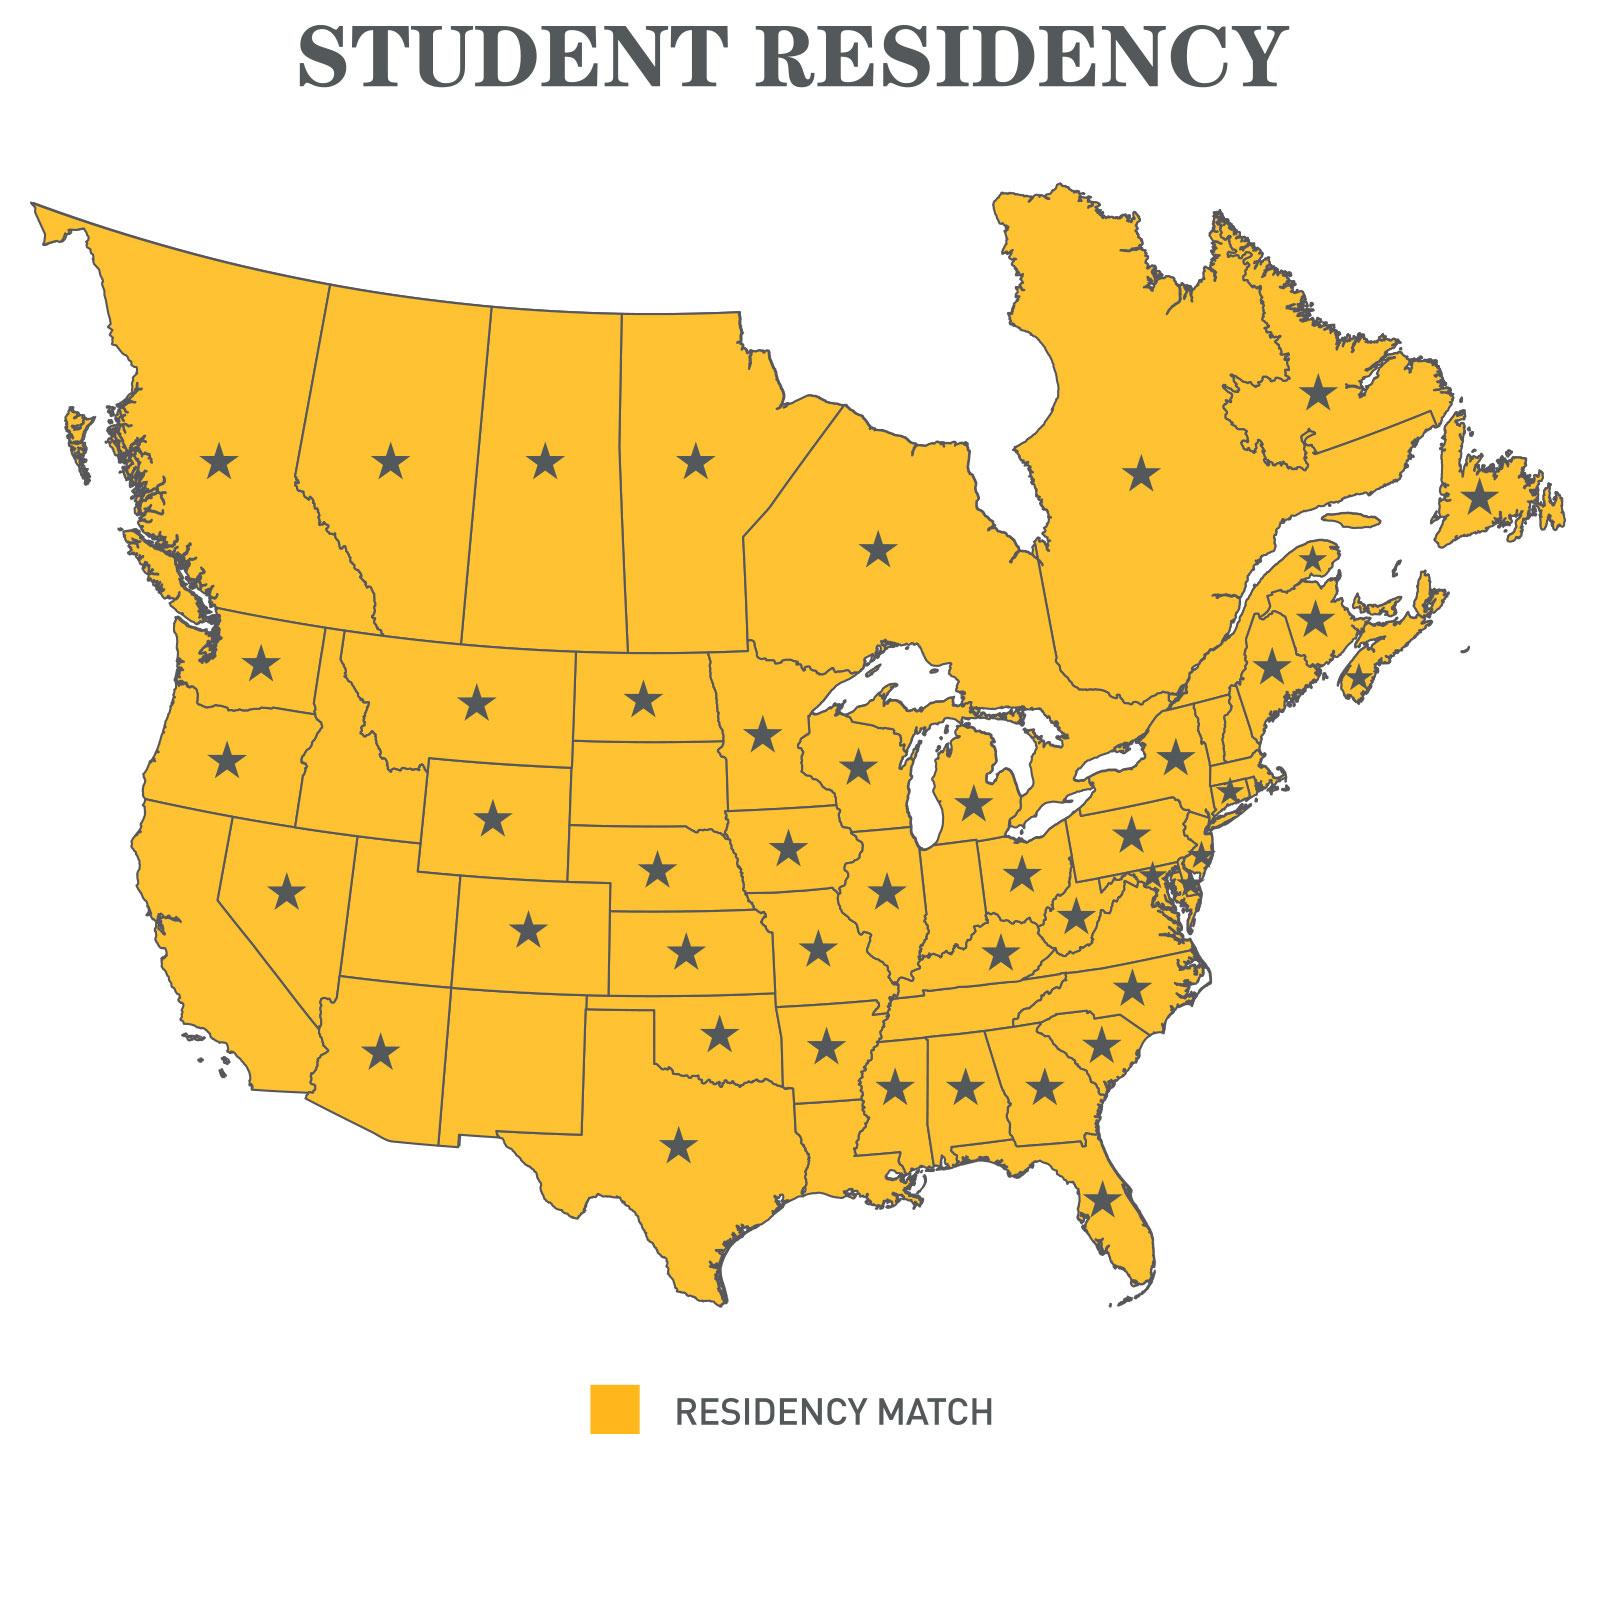 Student Residency